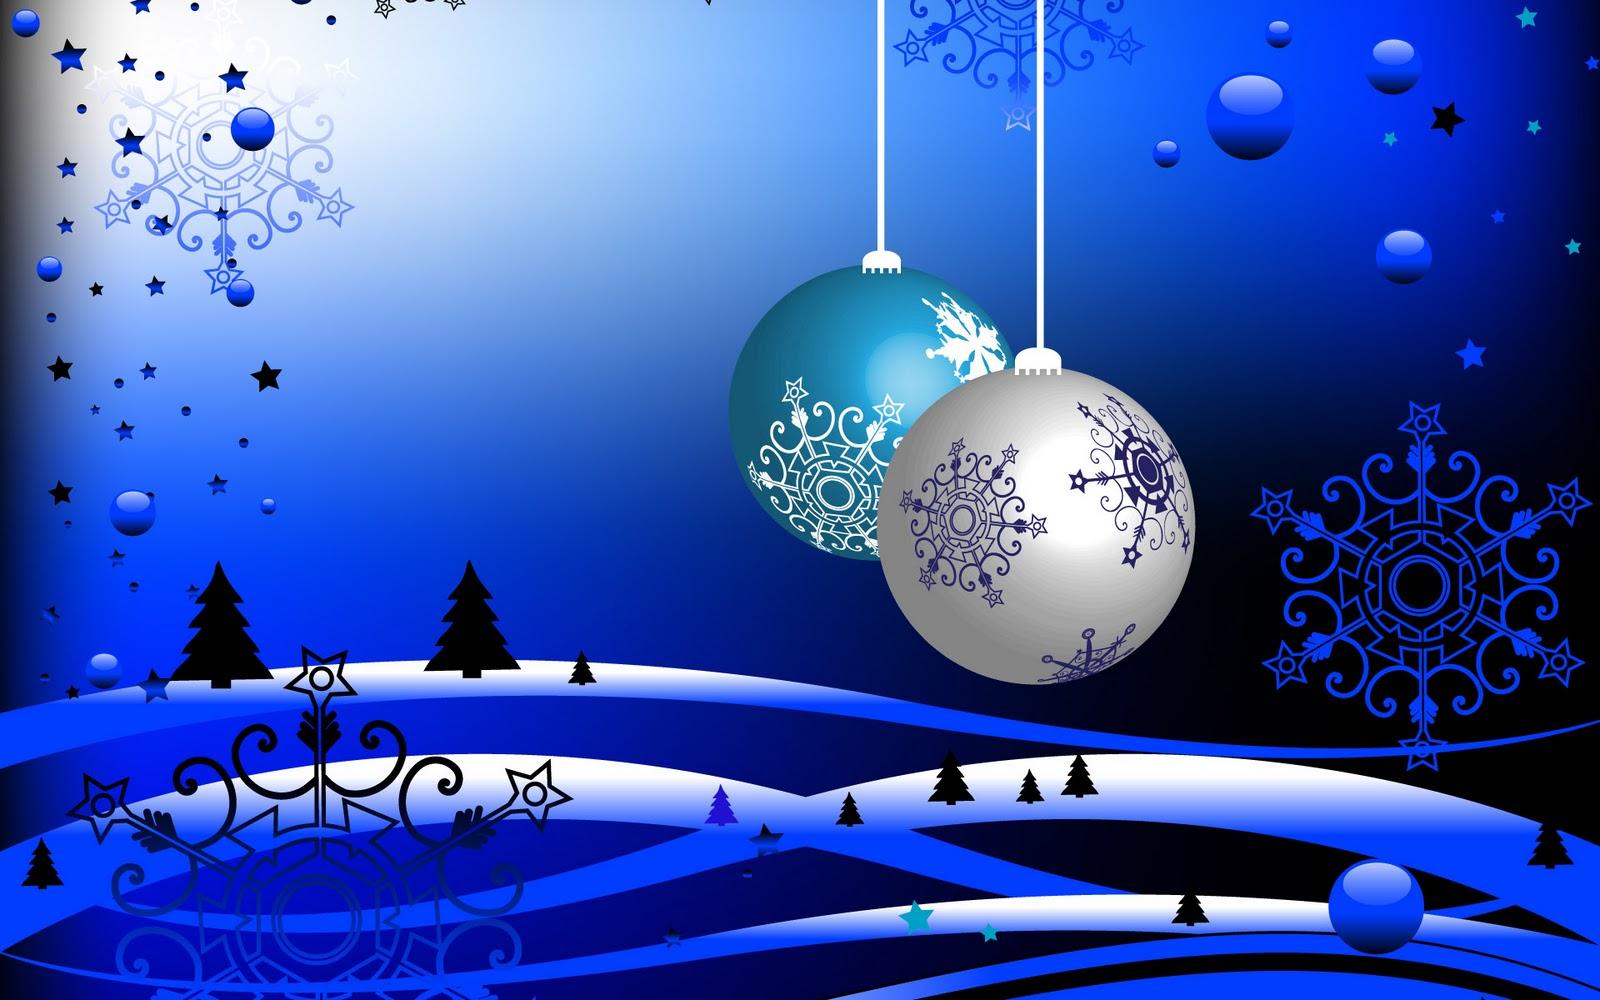 http://1.bp.blogspot.com/_o1df4WXRCs0/TP1dJ8VCDCI/AAAAAAAAAfs/Y-eDi2v726w/s1600/Christmas+%2528104%2529.jpg